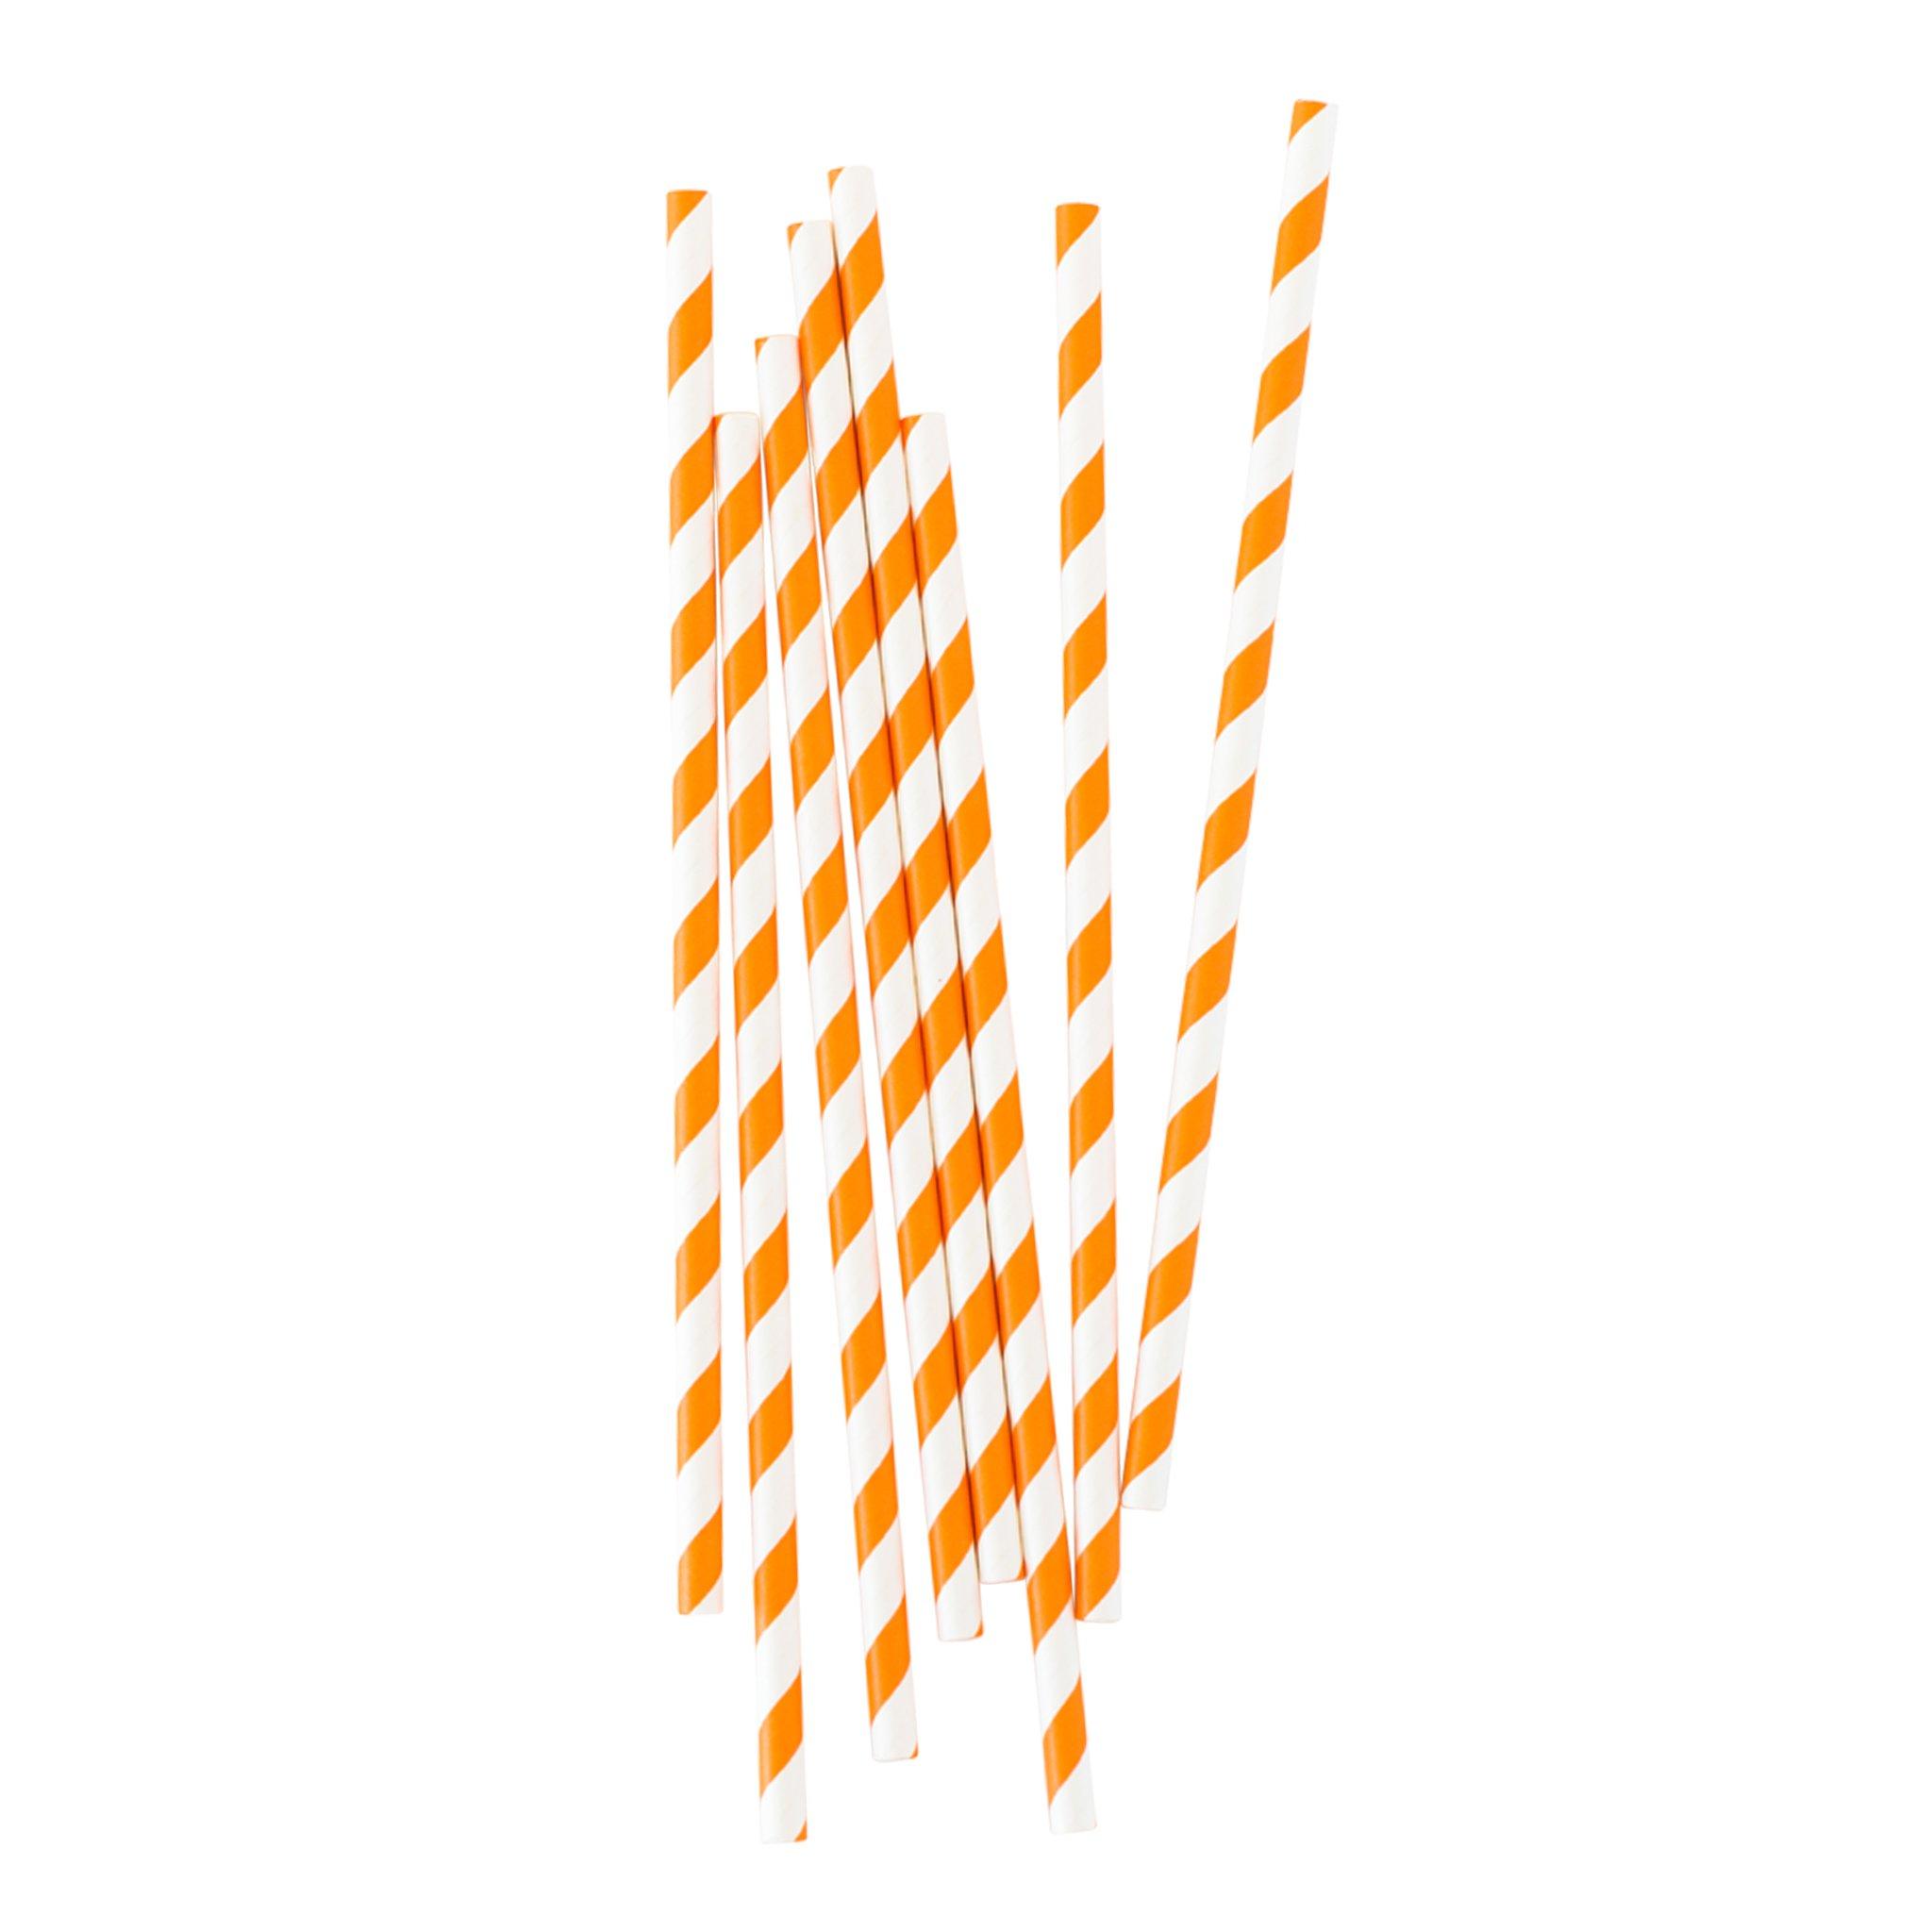 BUY ME / NEW ITEM $1.99 each Biodegradable Bright Orange Stripe Paper Straws - 25 Pack